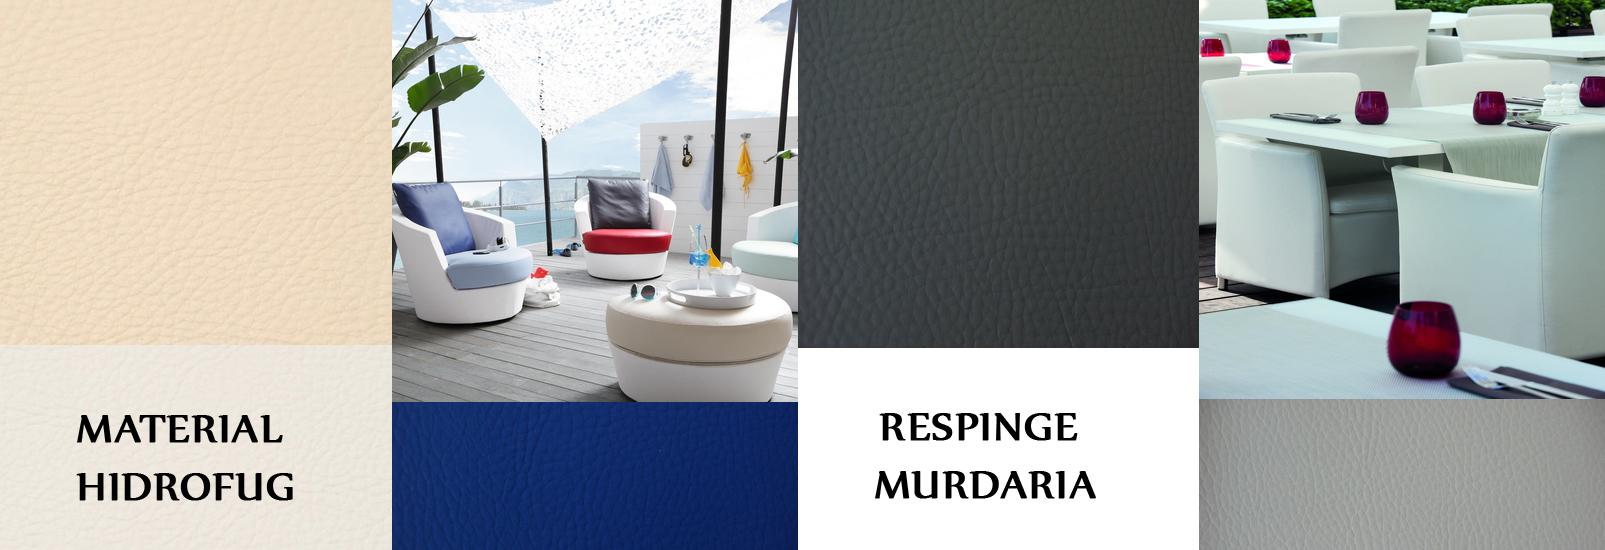 material_hidrofug_protectie_mucegai_rezistent_penetrarea_apei_outdoor_Pescara_colaj